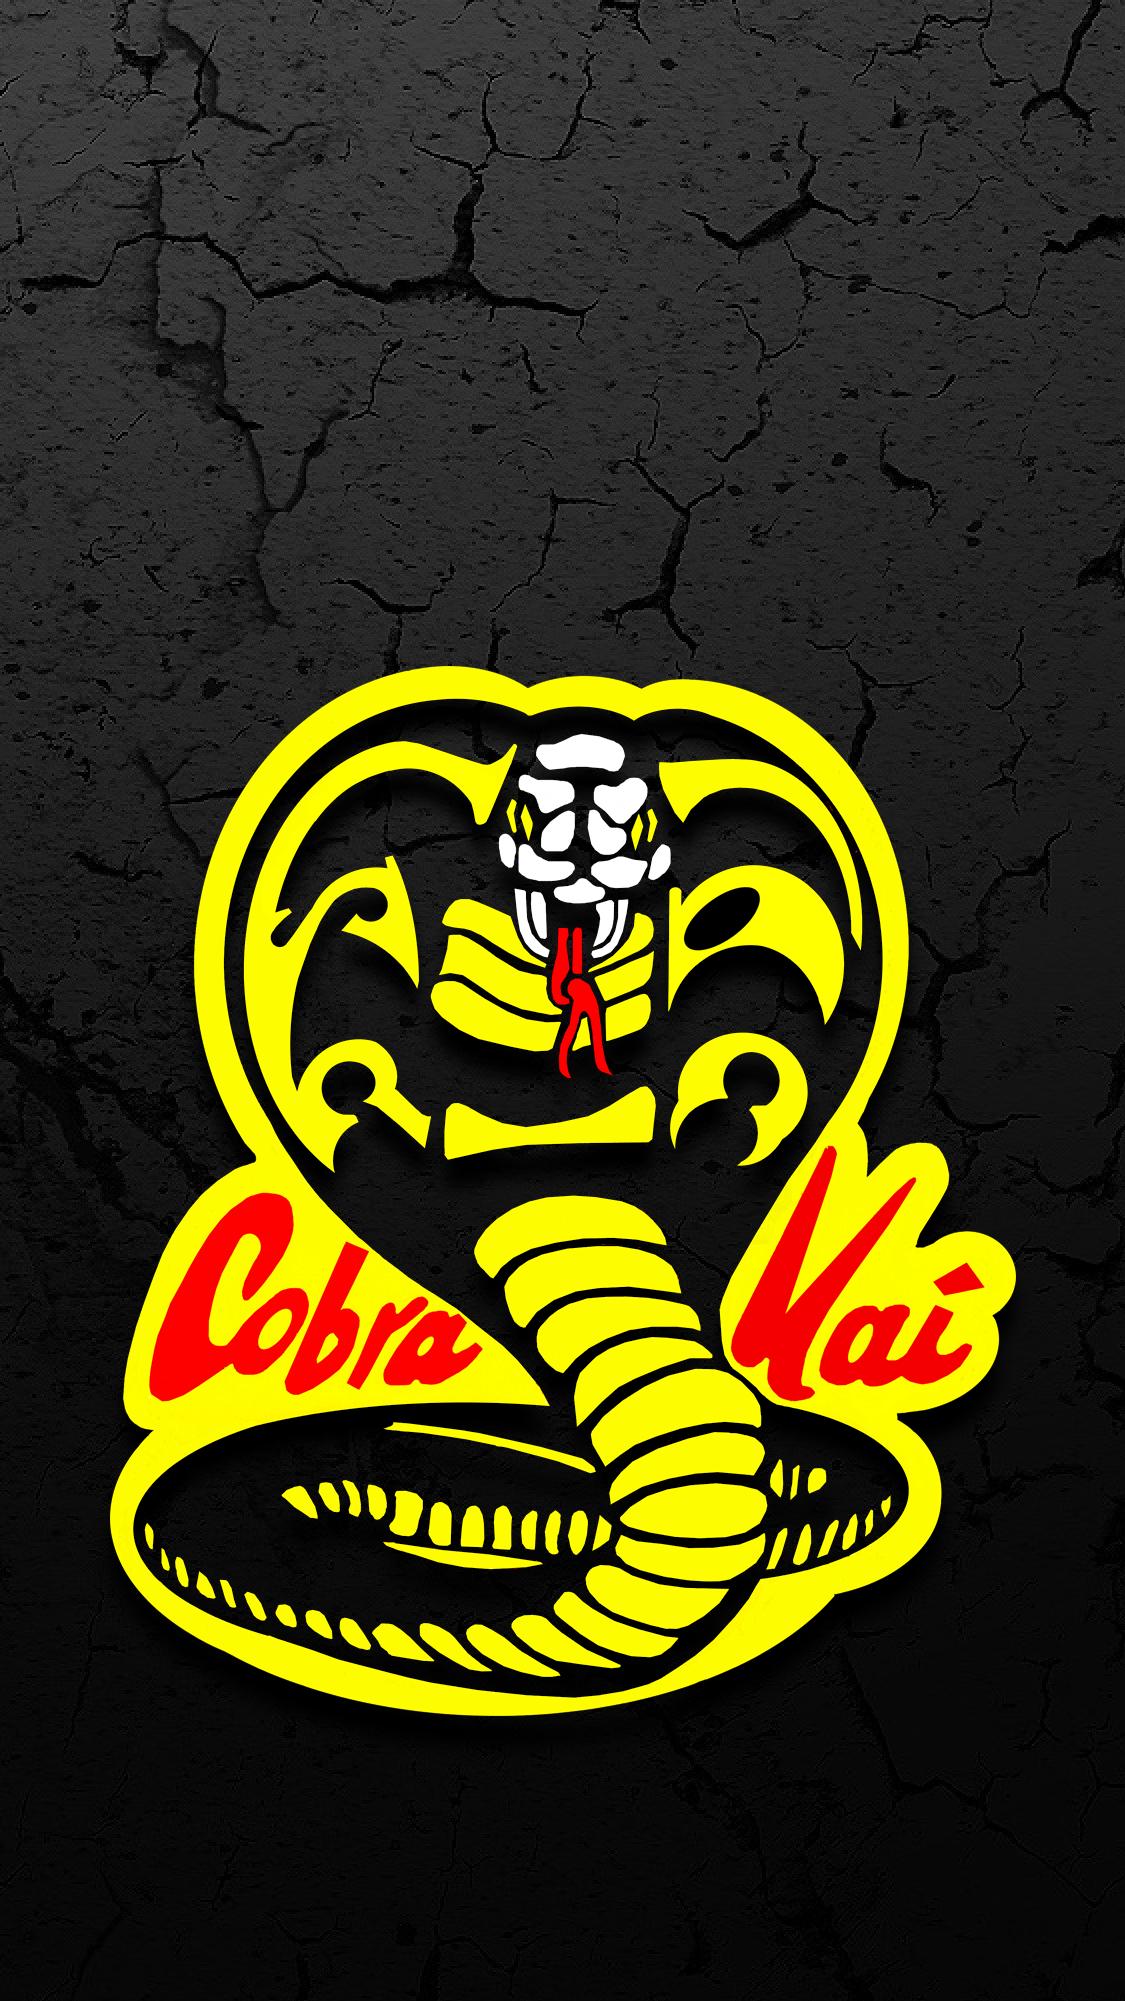 Cobra Kai Wallpapers 1125x2001